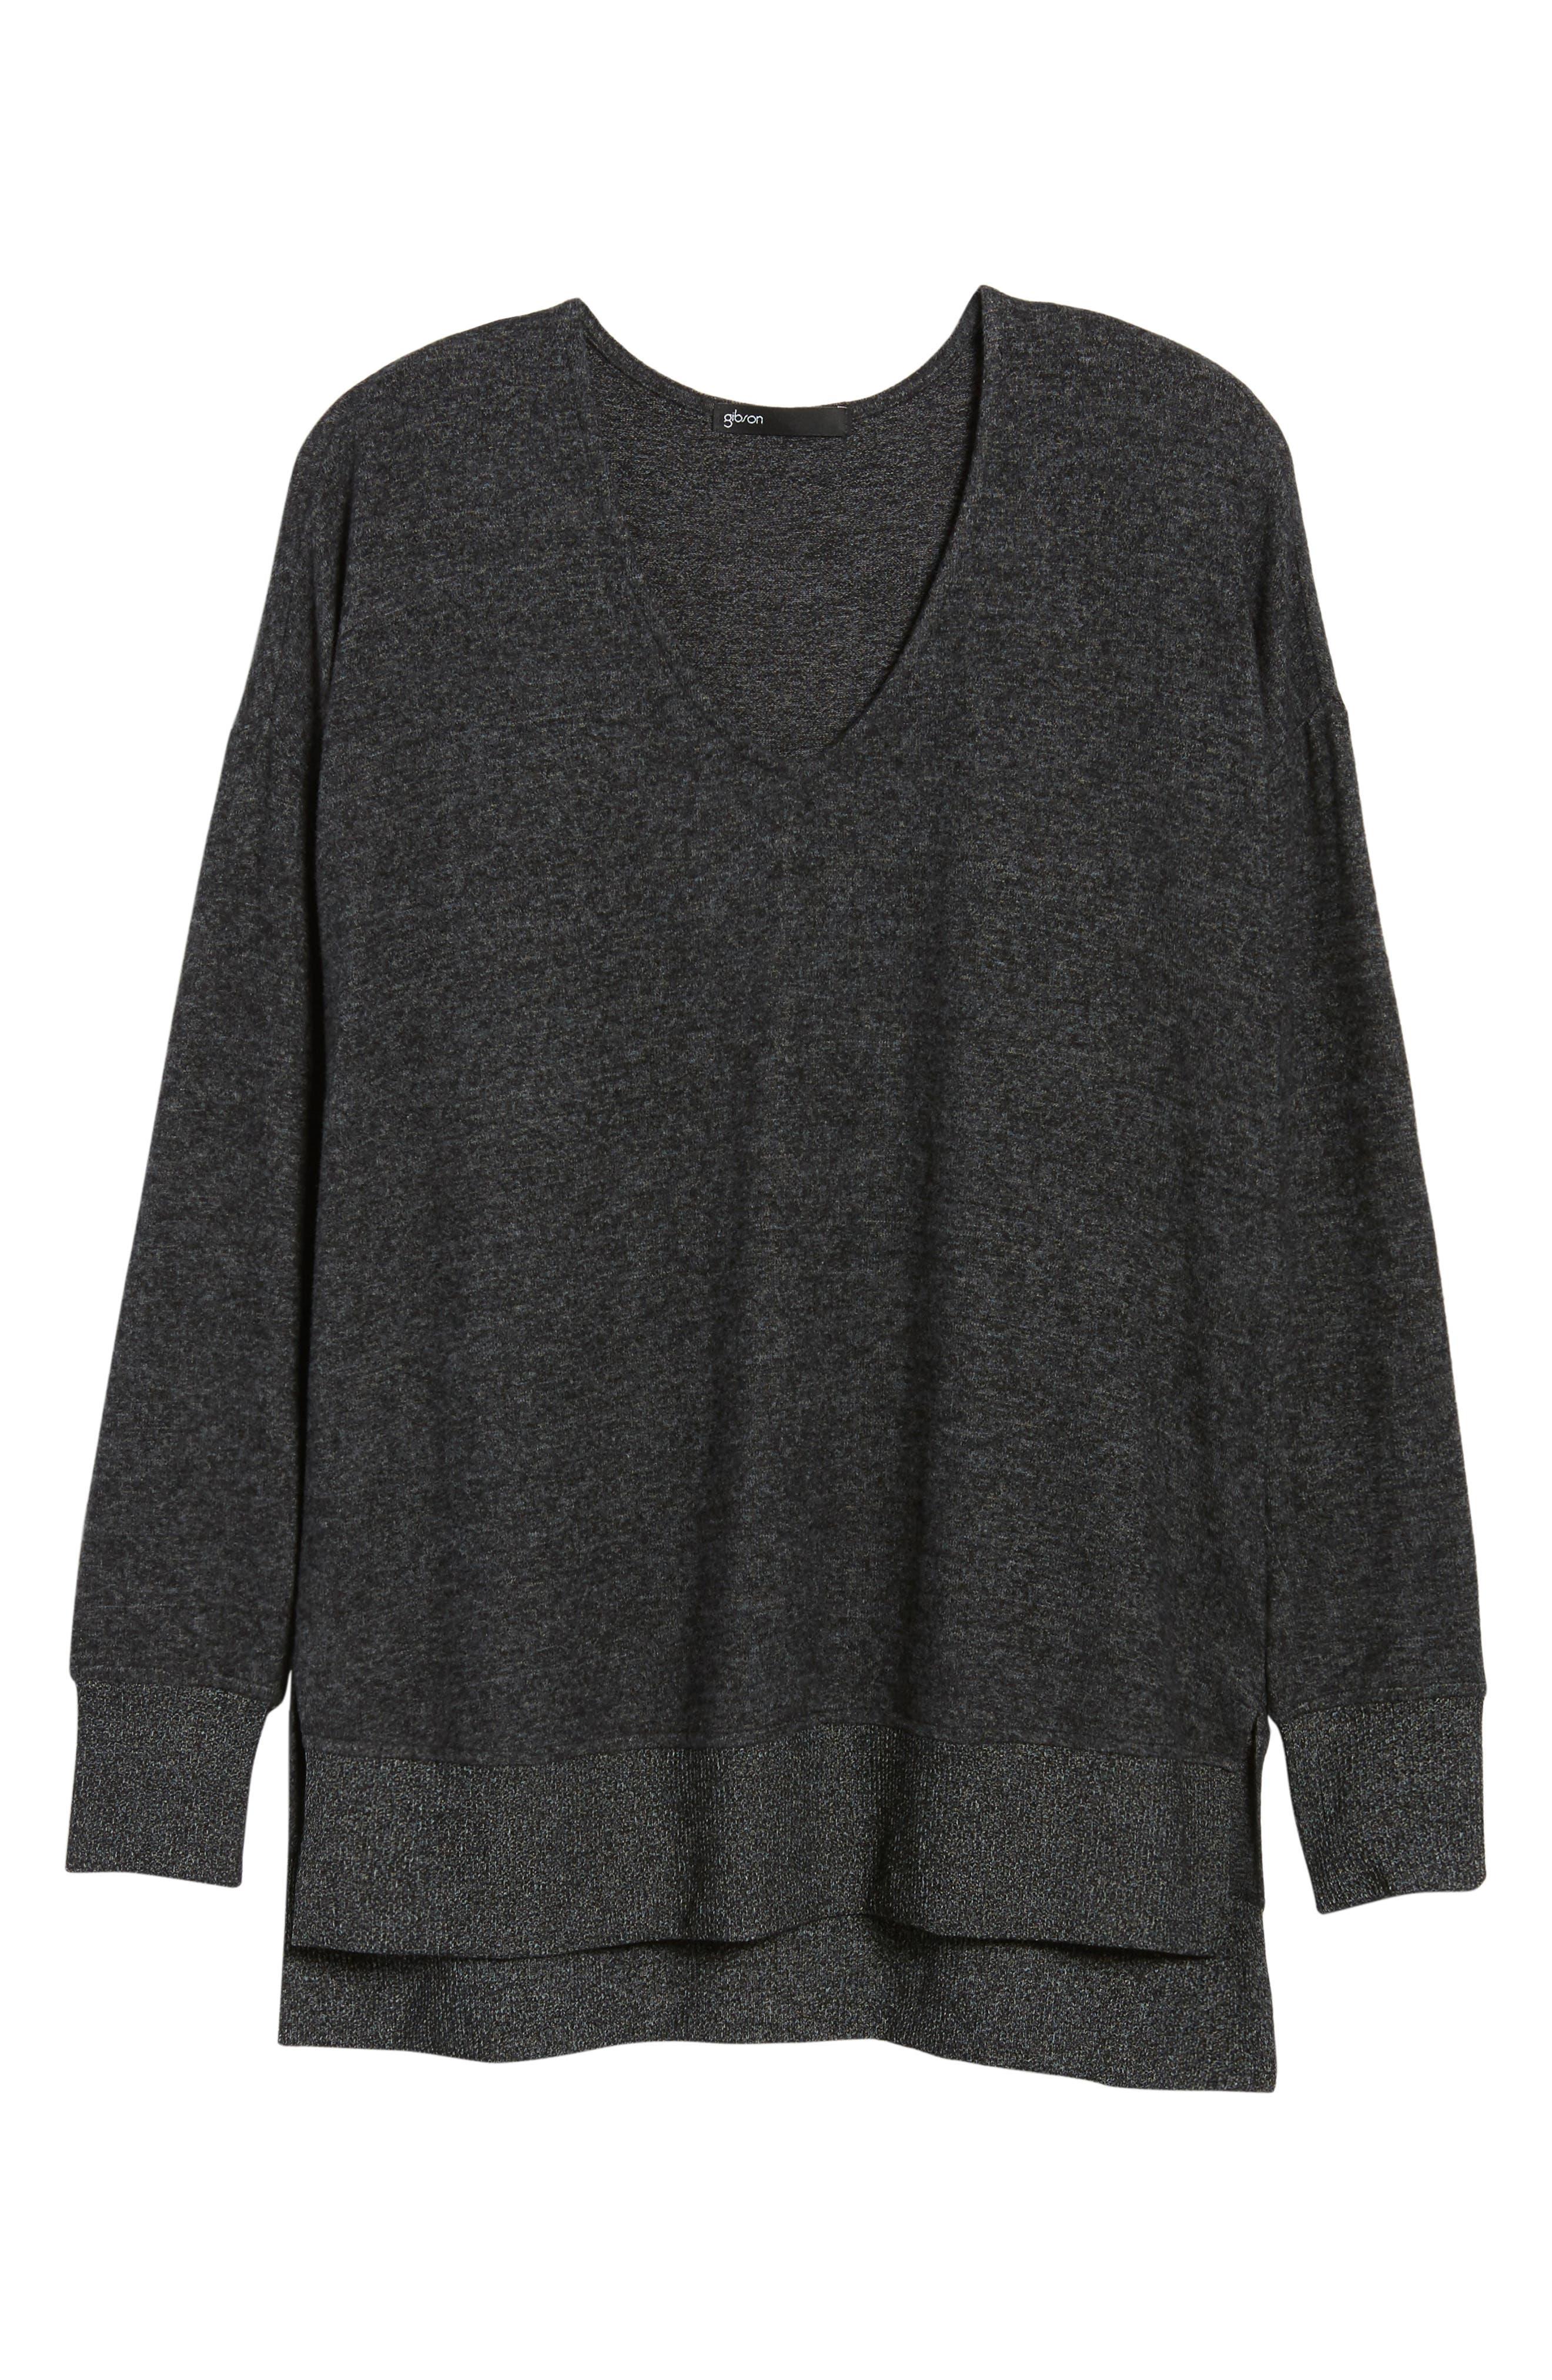 Cozy Sweatshirt,                             Alternate thumbnail 6, color,                             BLACK